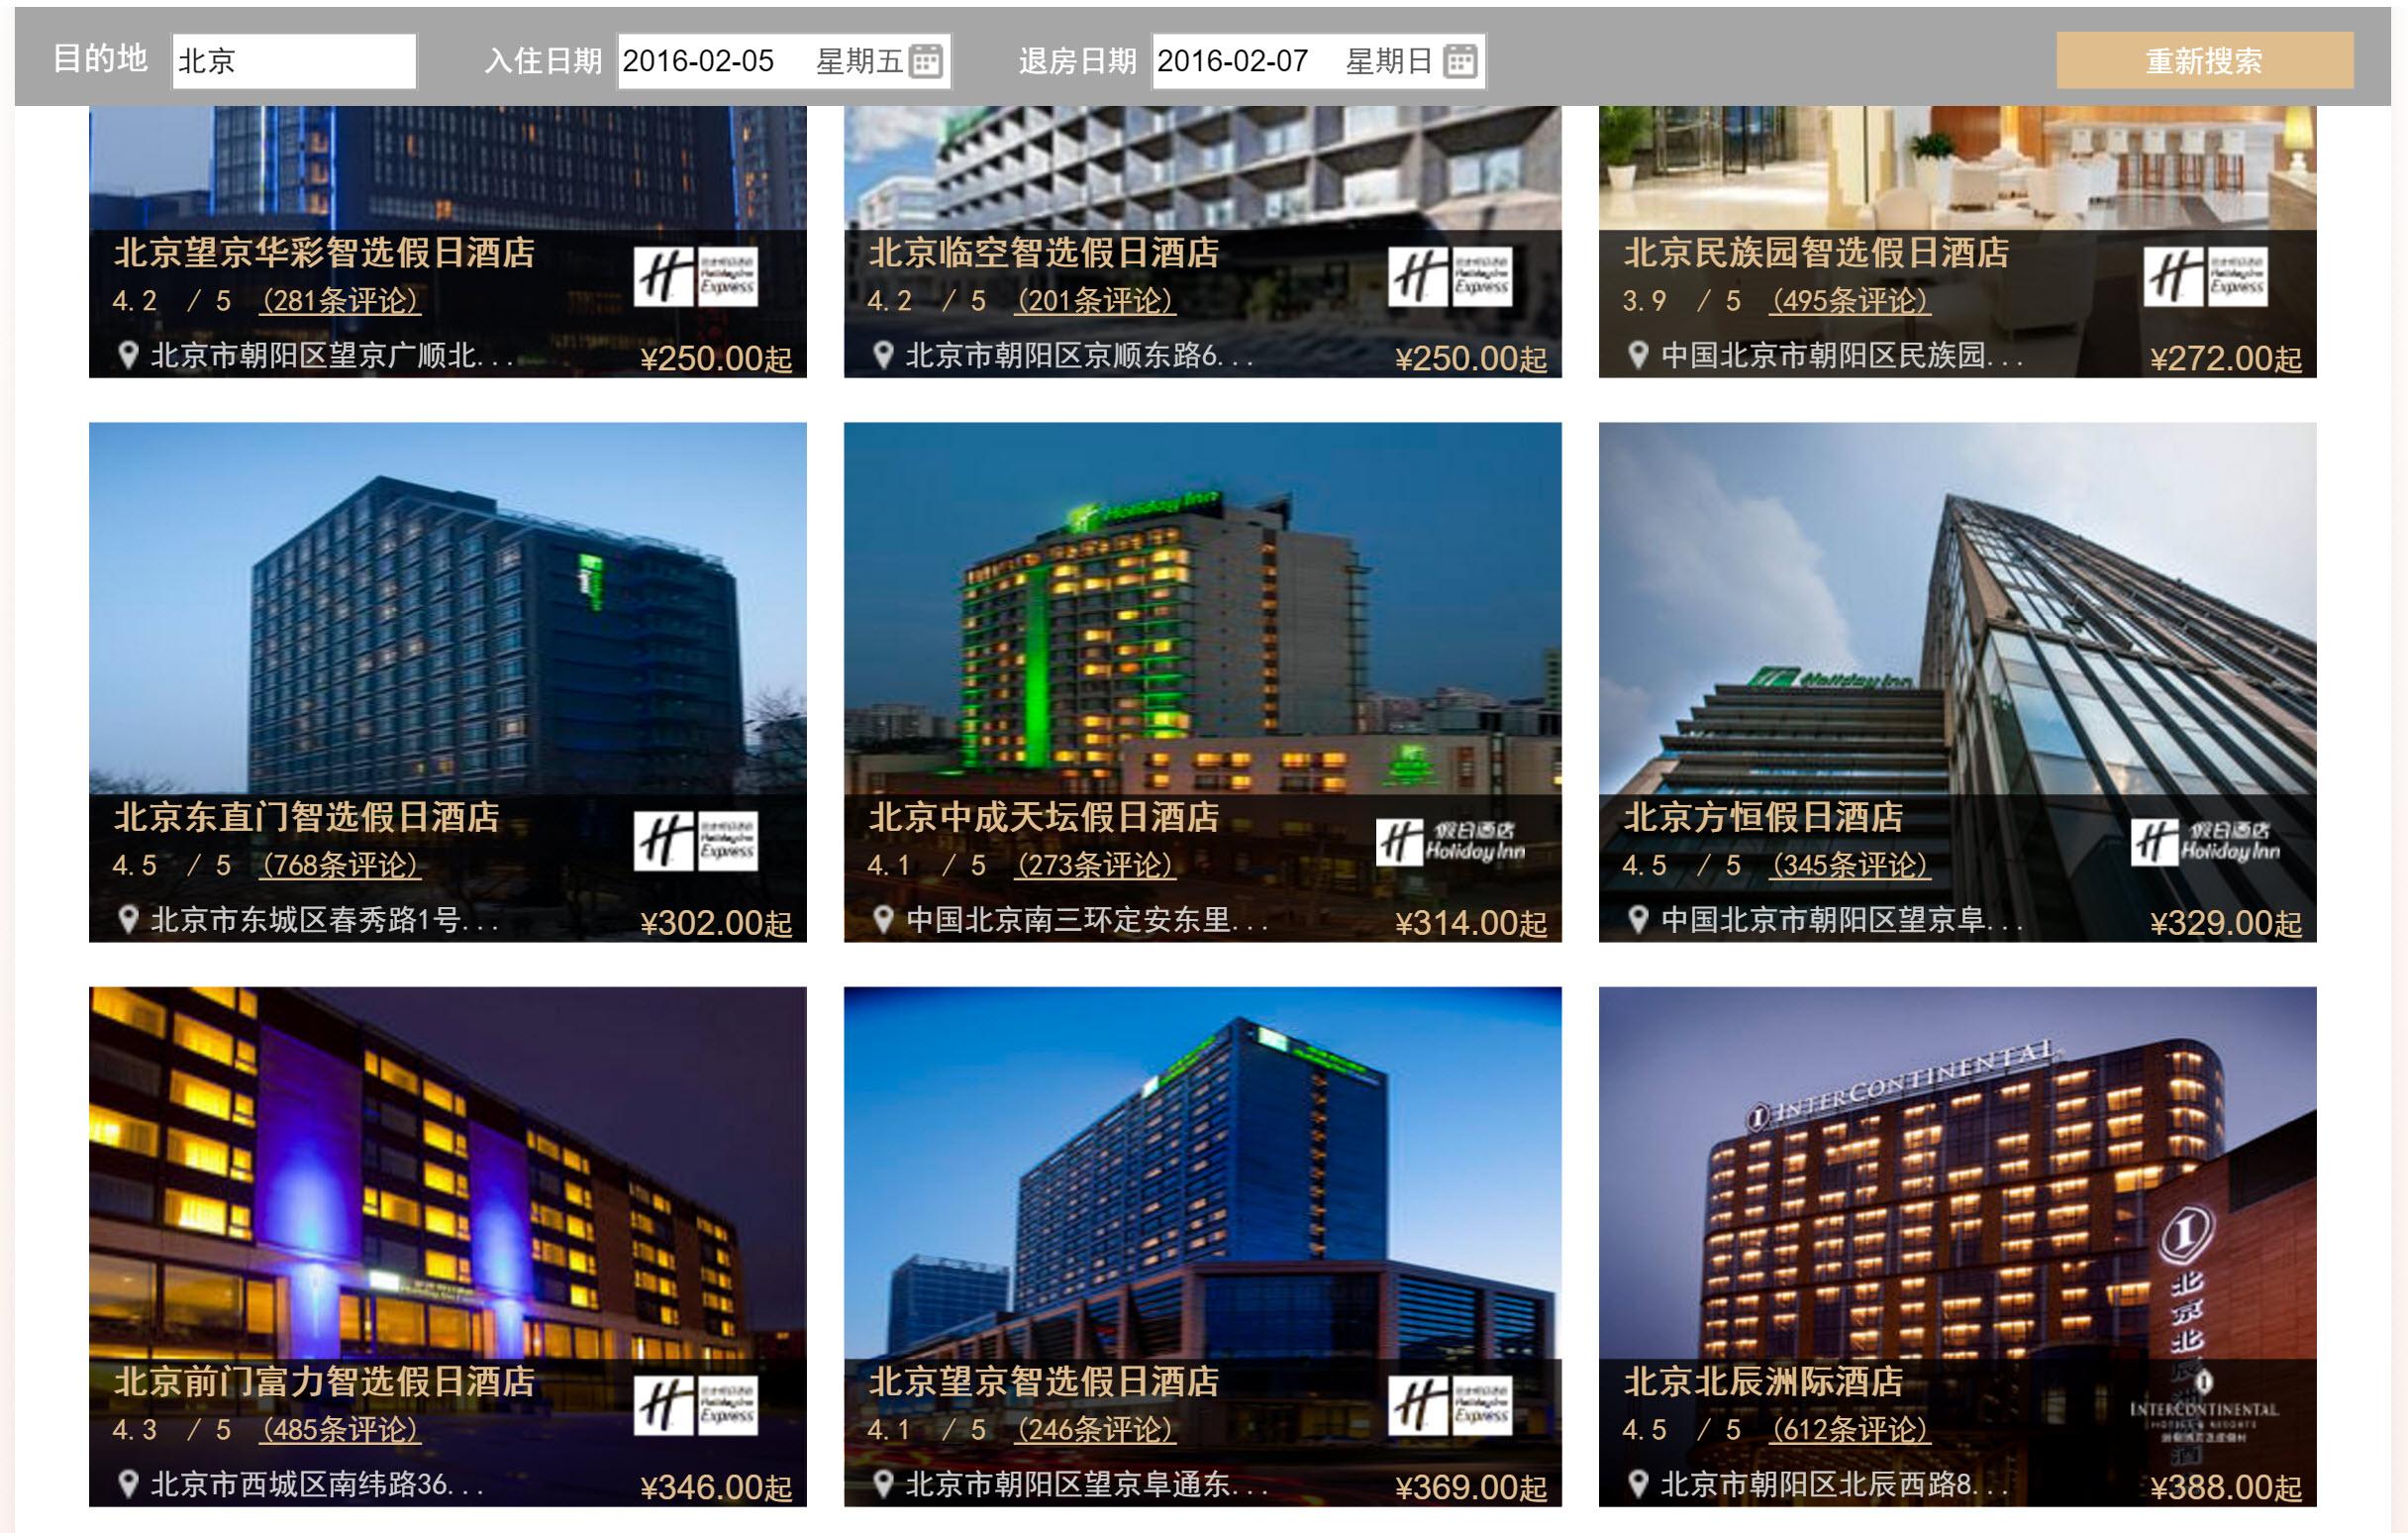 2016-january-ihg-china-sale-beijing